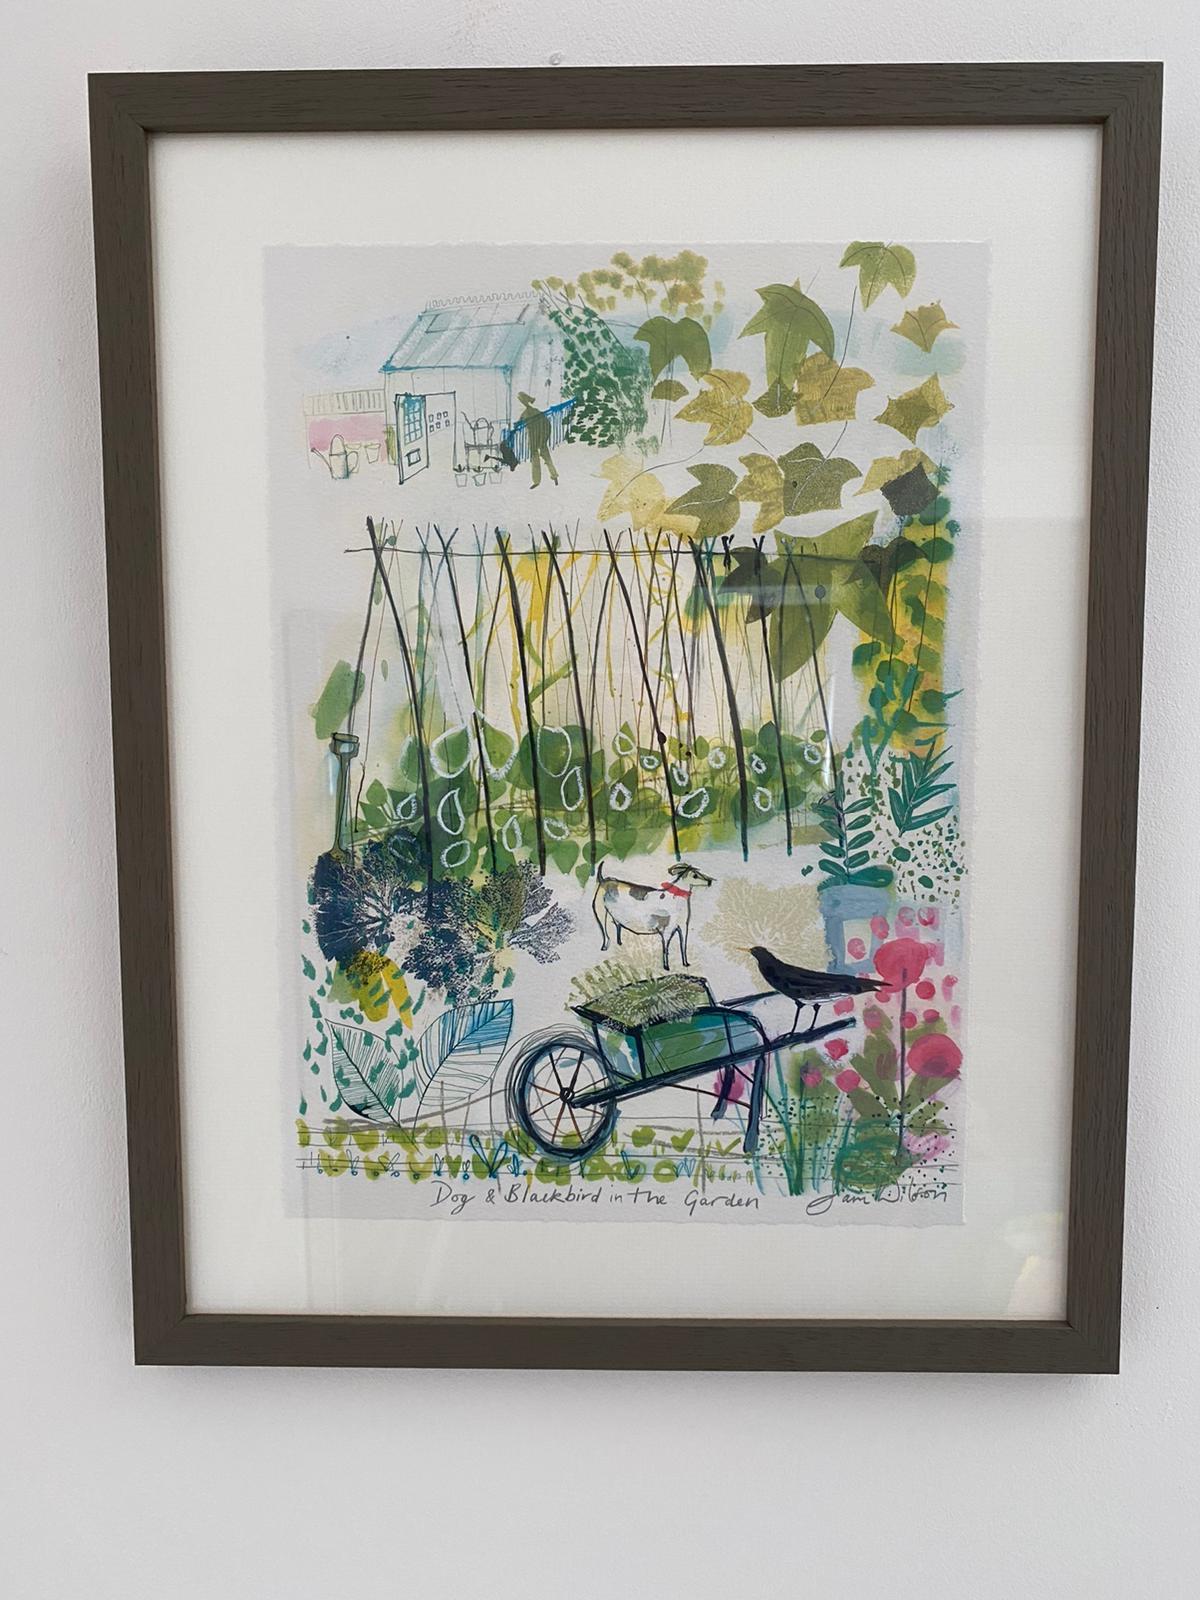 Sam Wilson Illustrations - Dog & Blackbird in the Garden